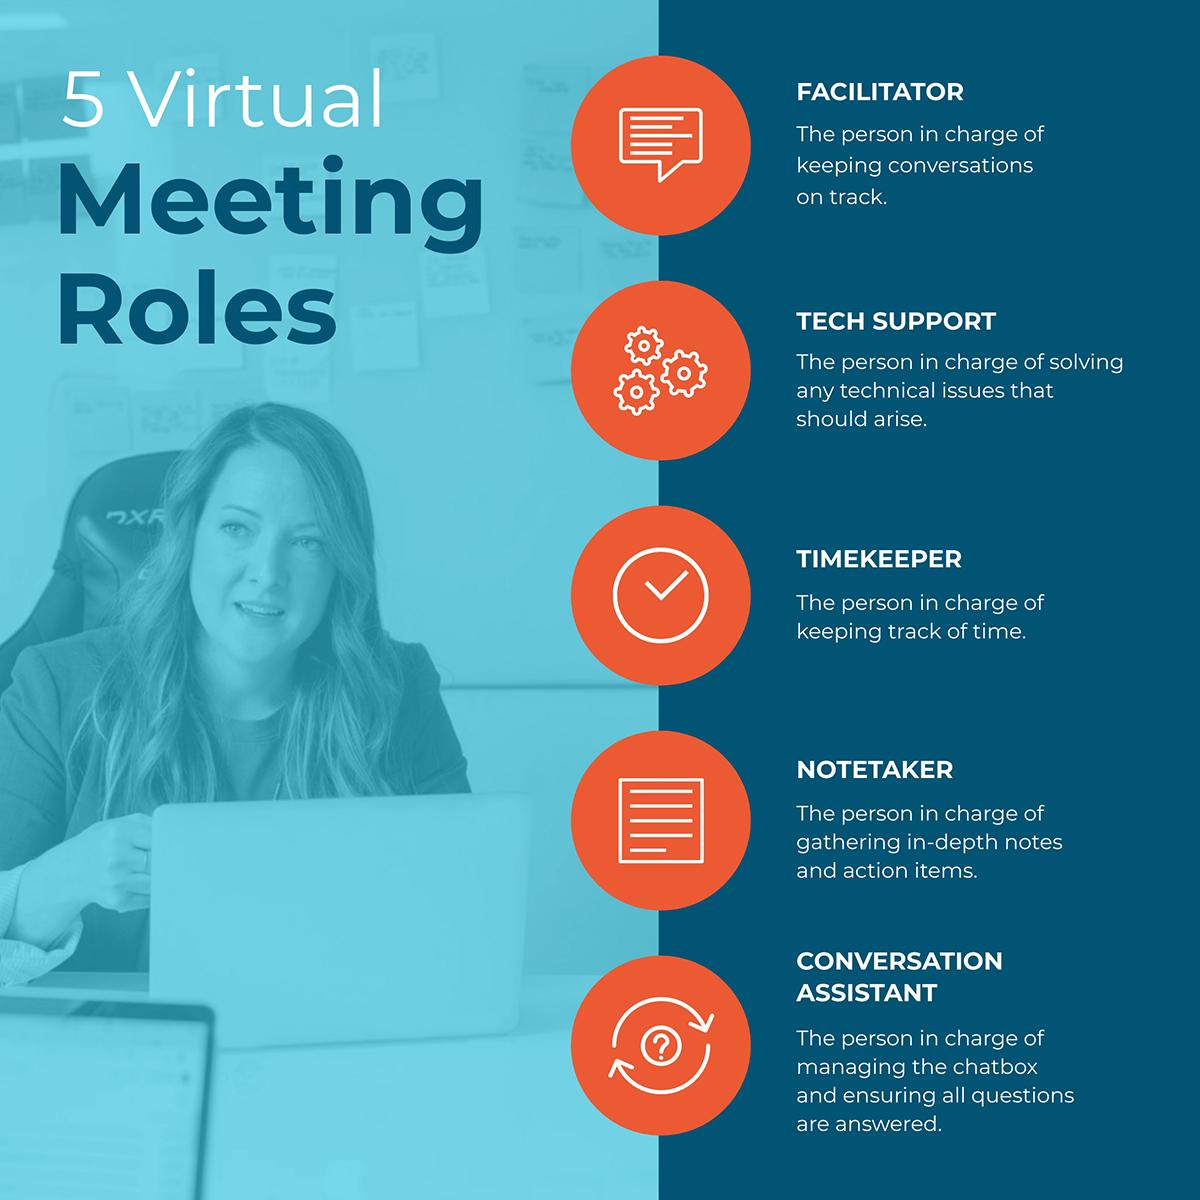 virtual meeting - description of roles